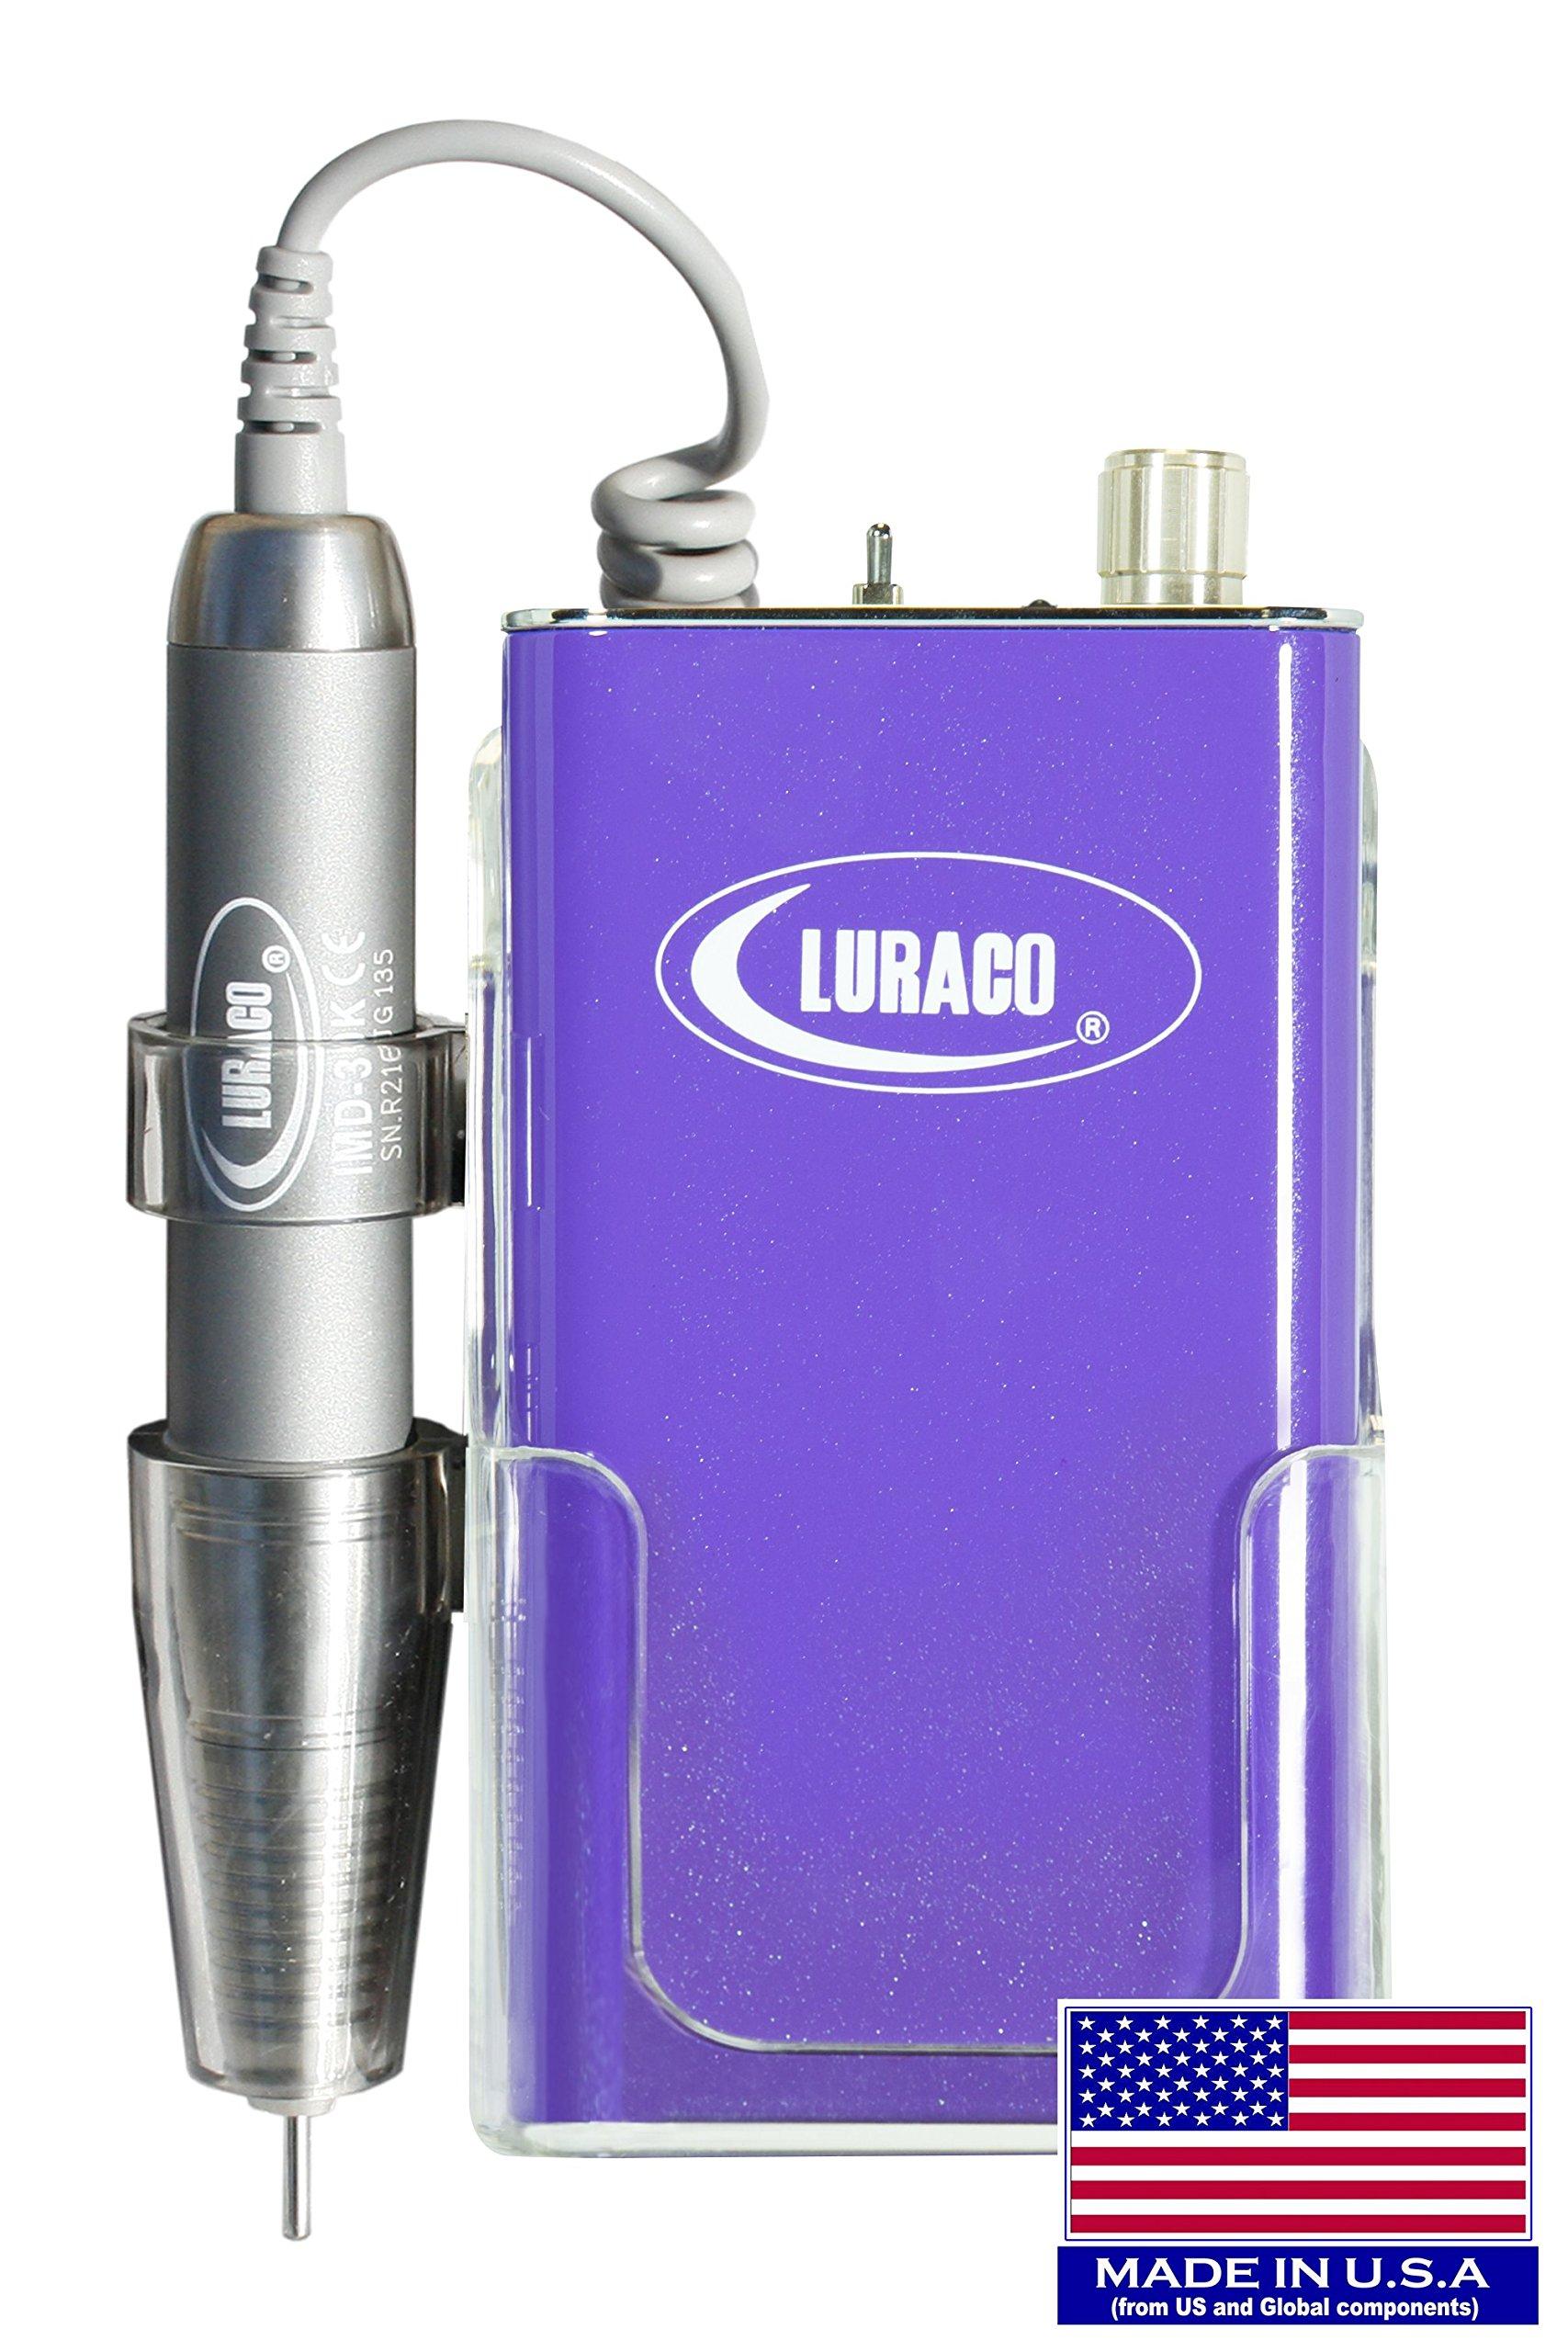 Luraco Pro-30K Electric Nail File (Drill)-Purple